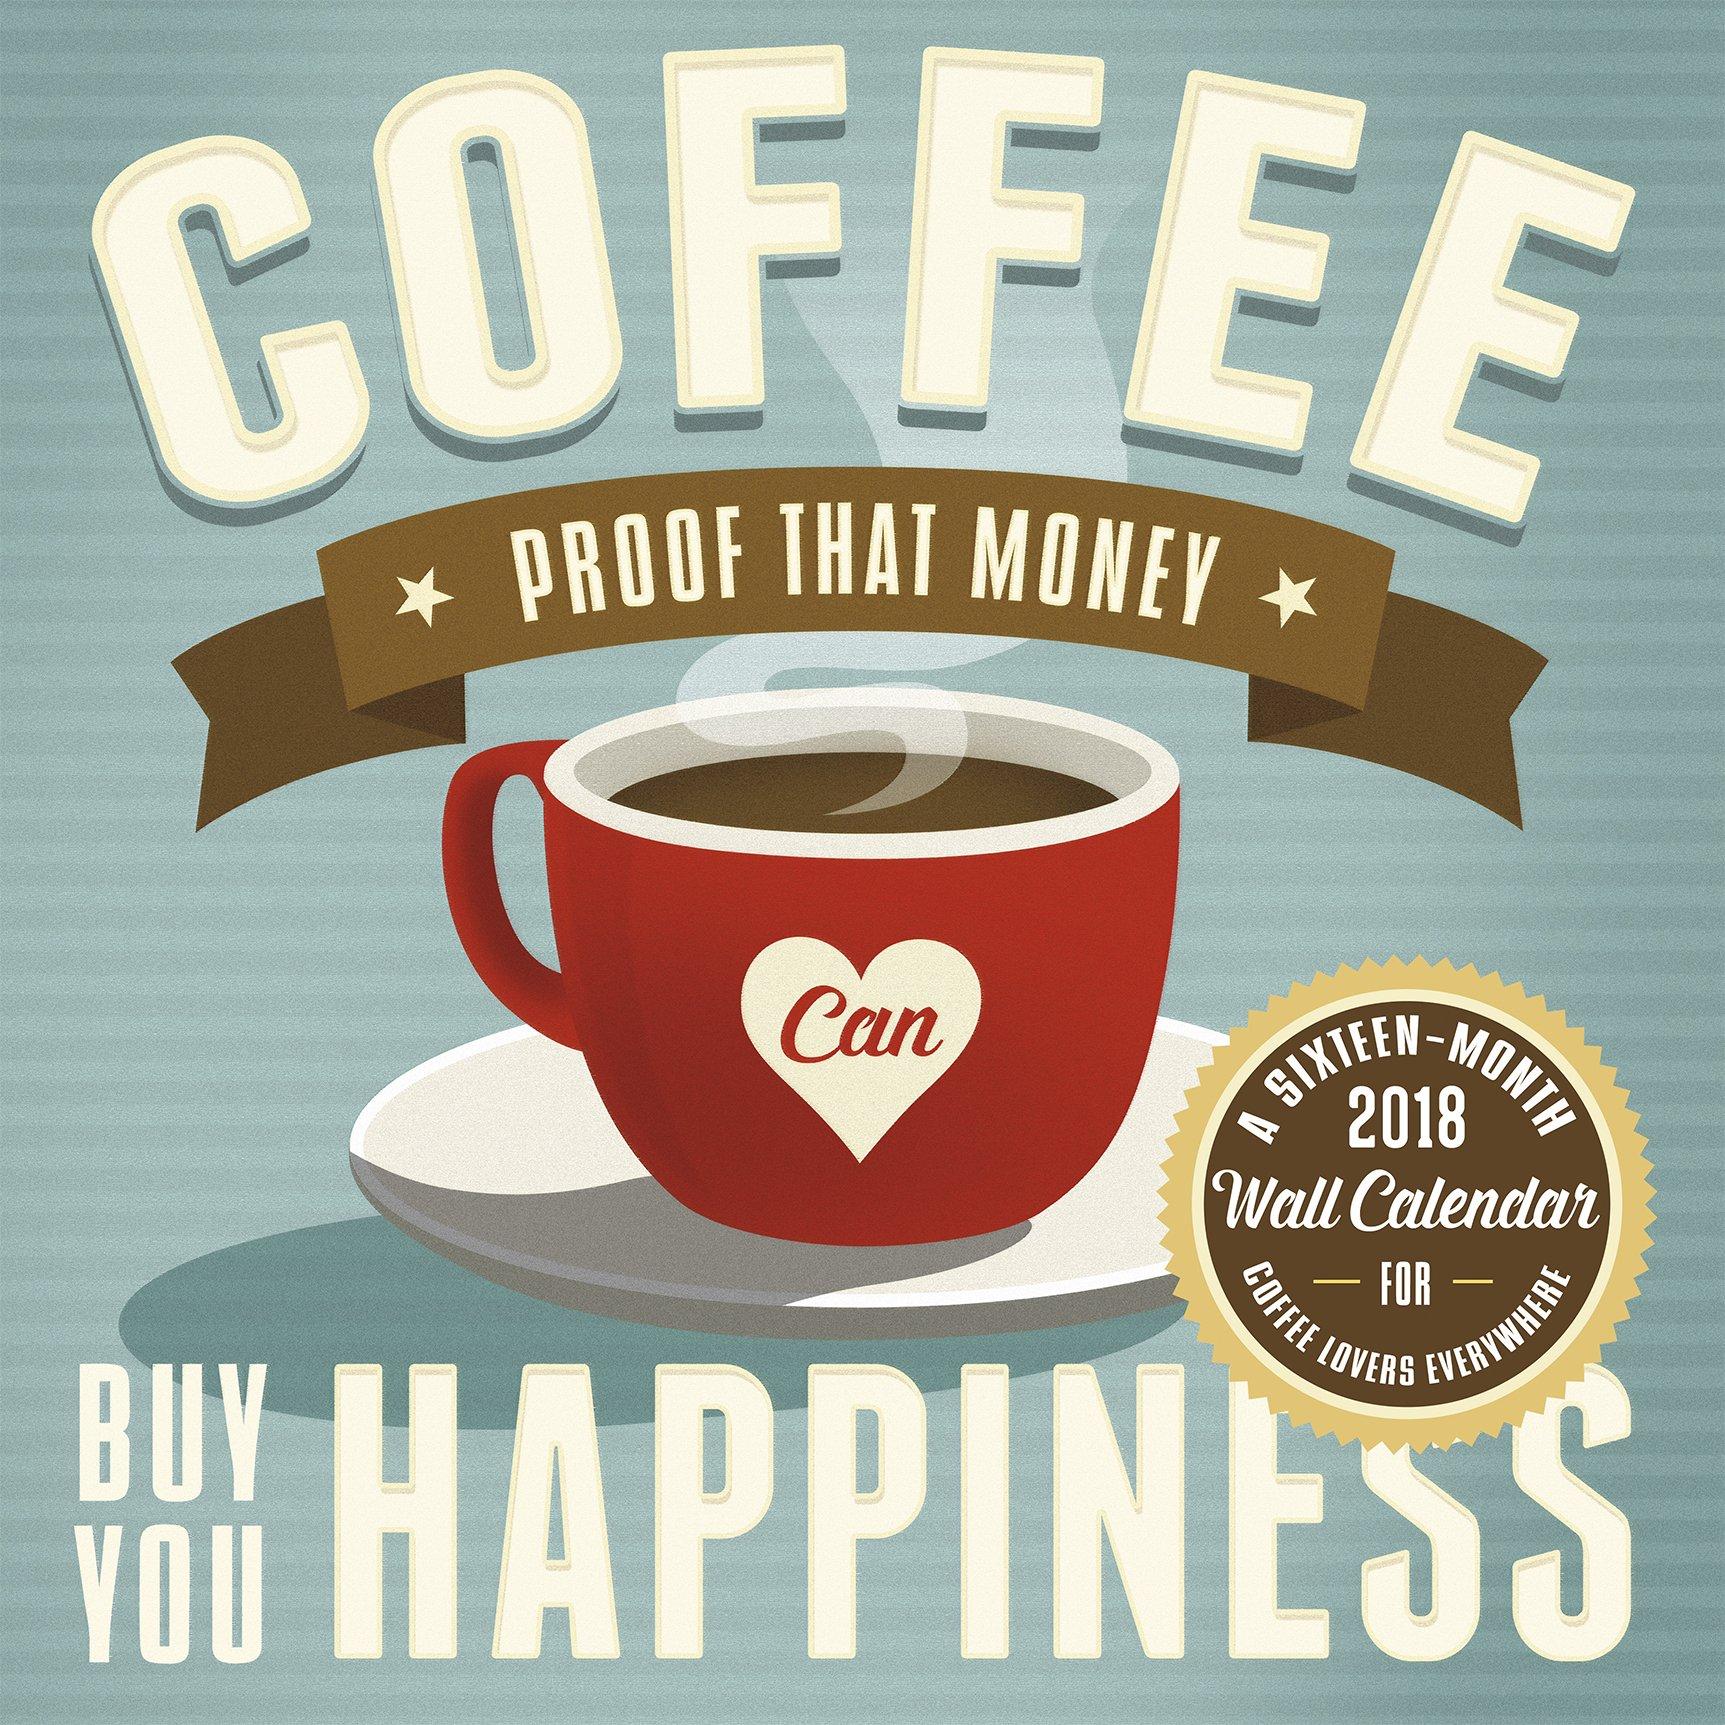 Coffee Addiction Cory Steffen 2018 Wall Calendar: Trends International:  0057668883520: Amazon.com: Books